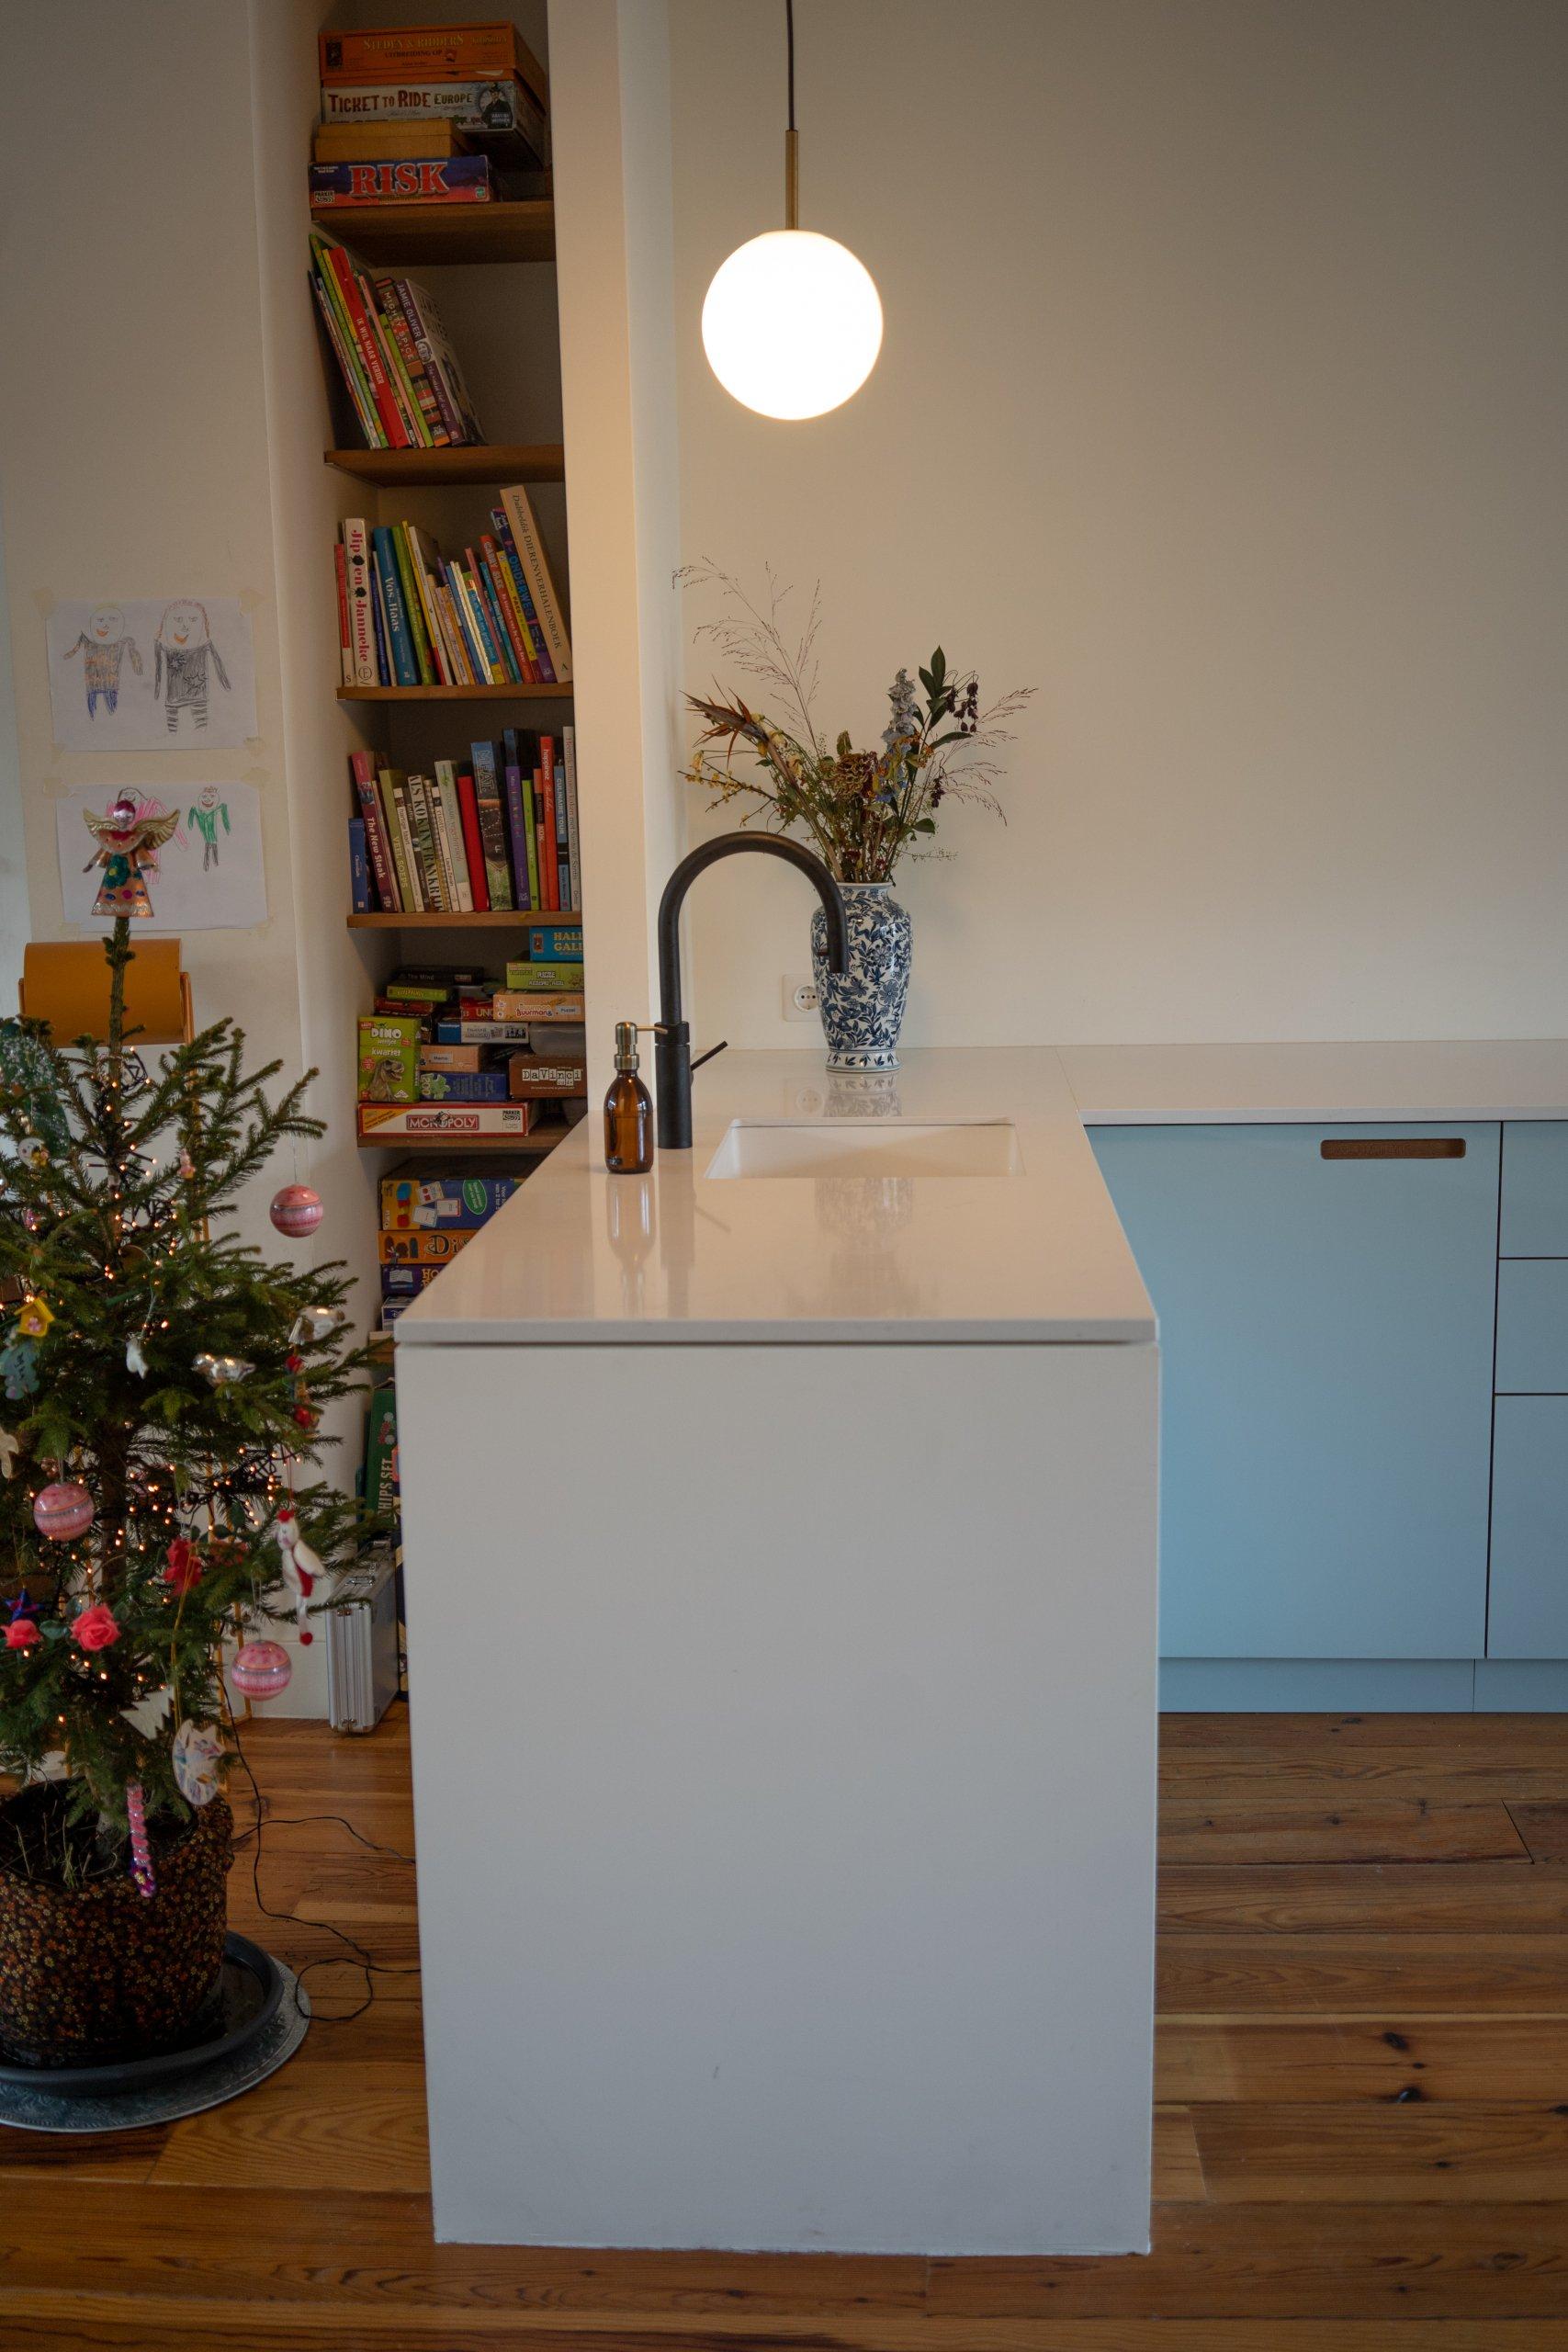 keuken resopal hpl cashmere en petrol met massief iepen details en nisjes